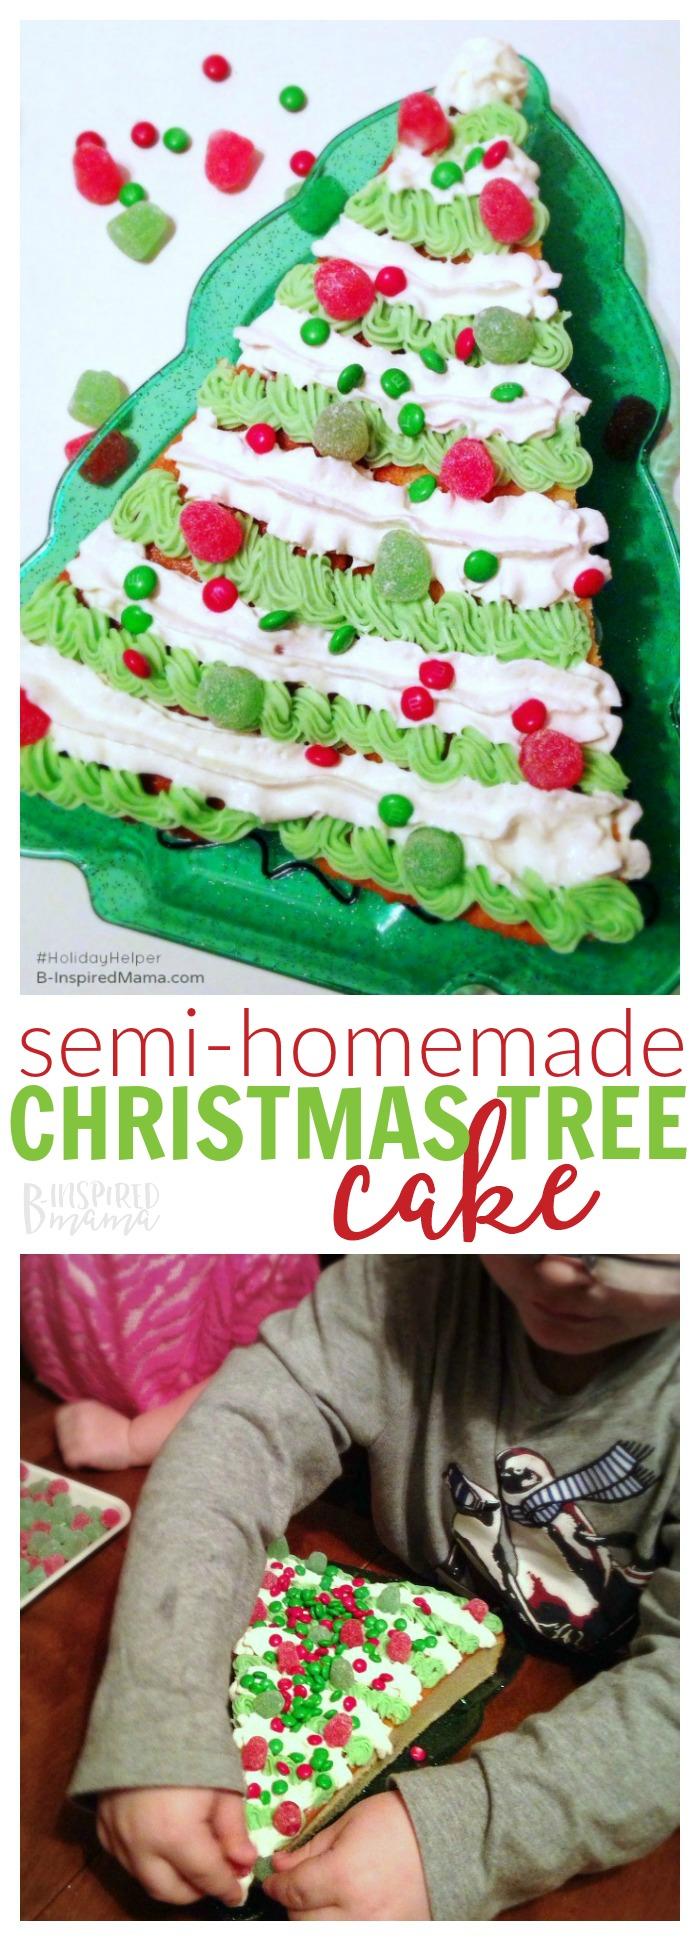 A Semi Homemade Christmas Tree Cake